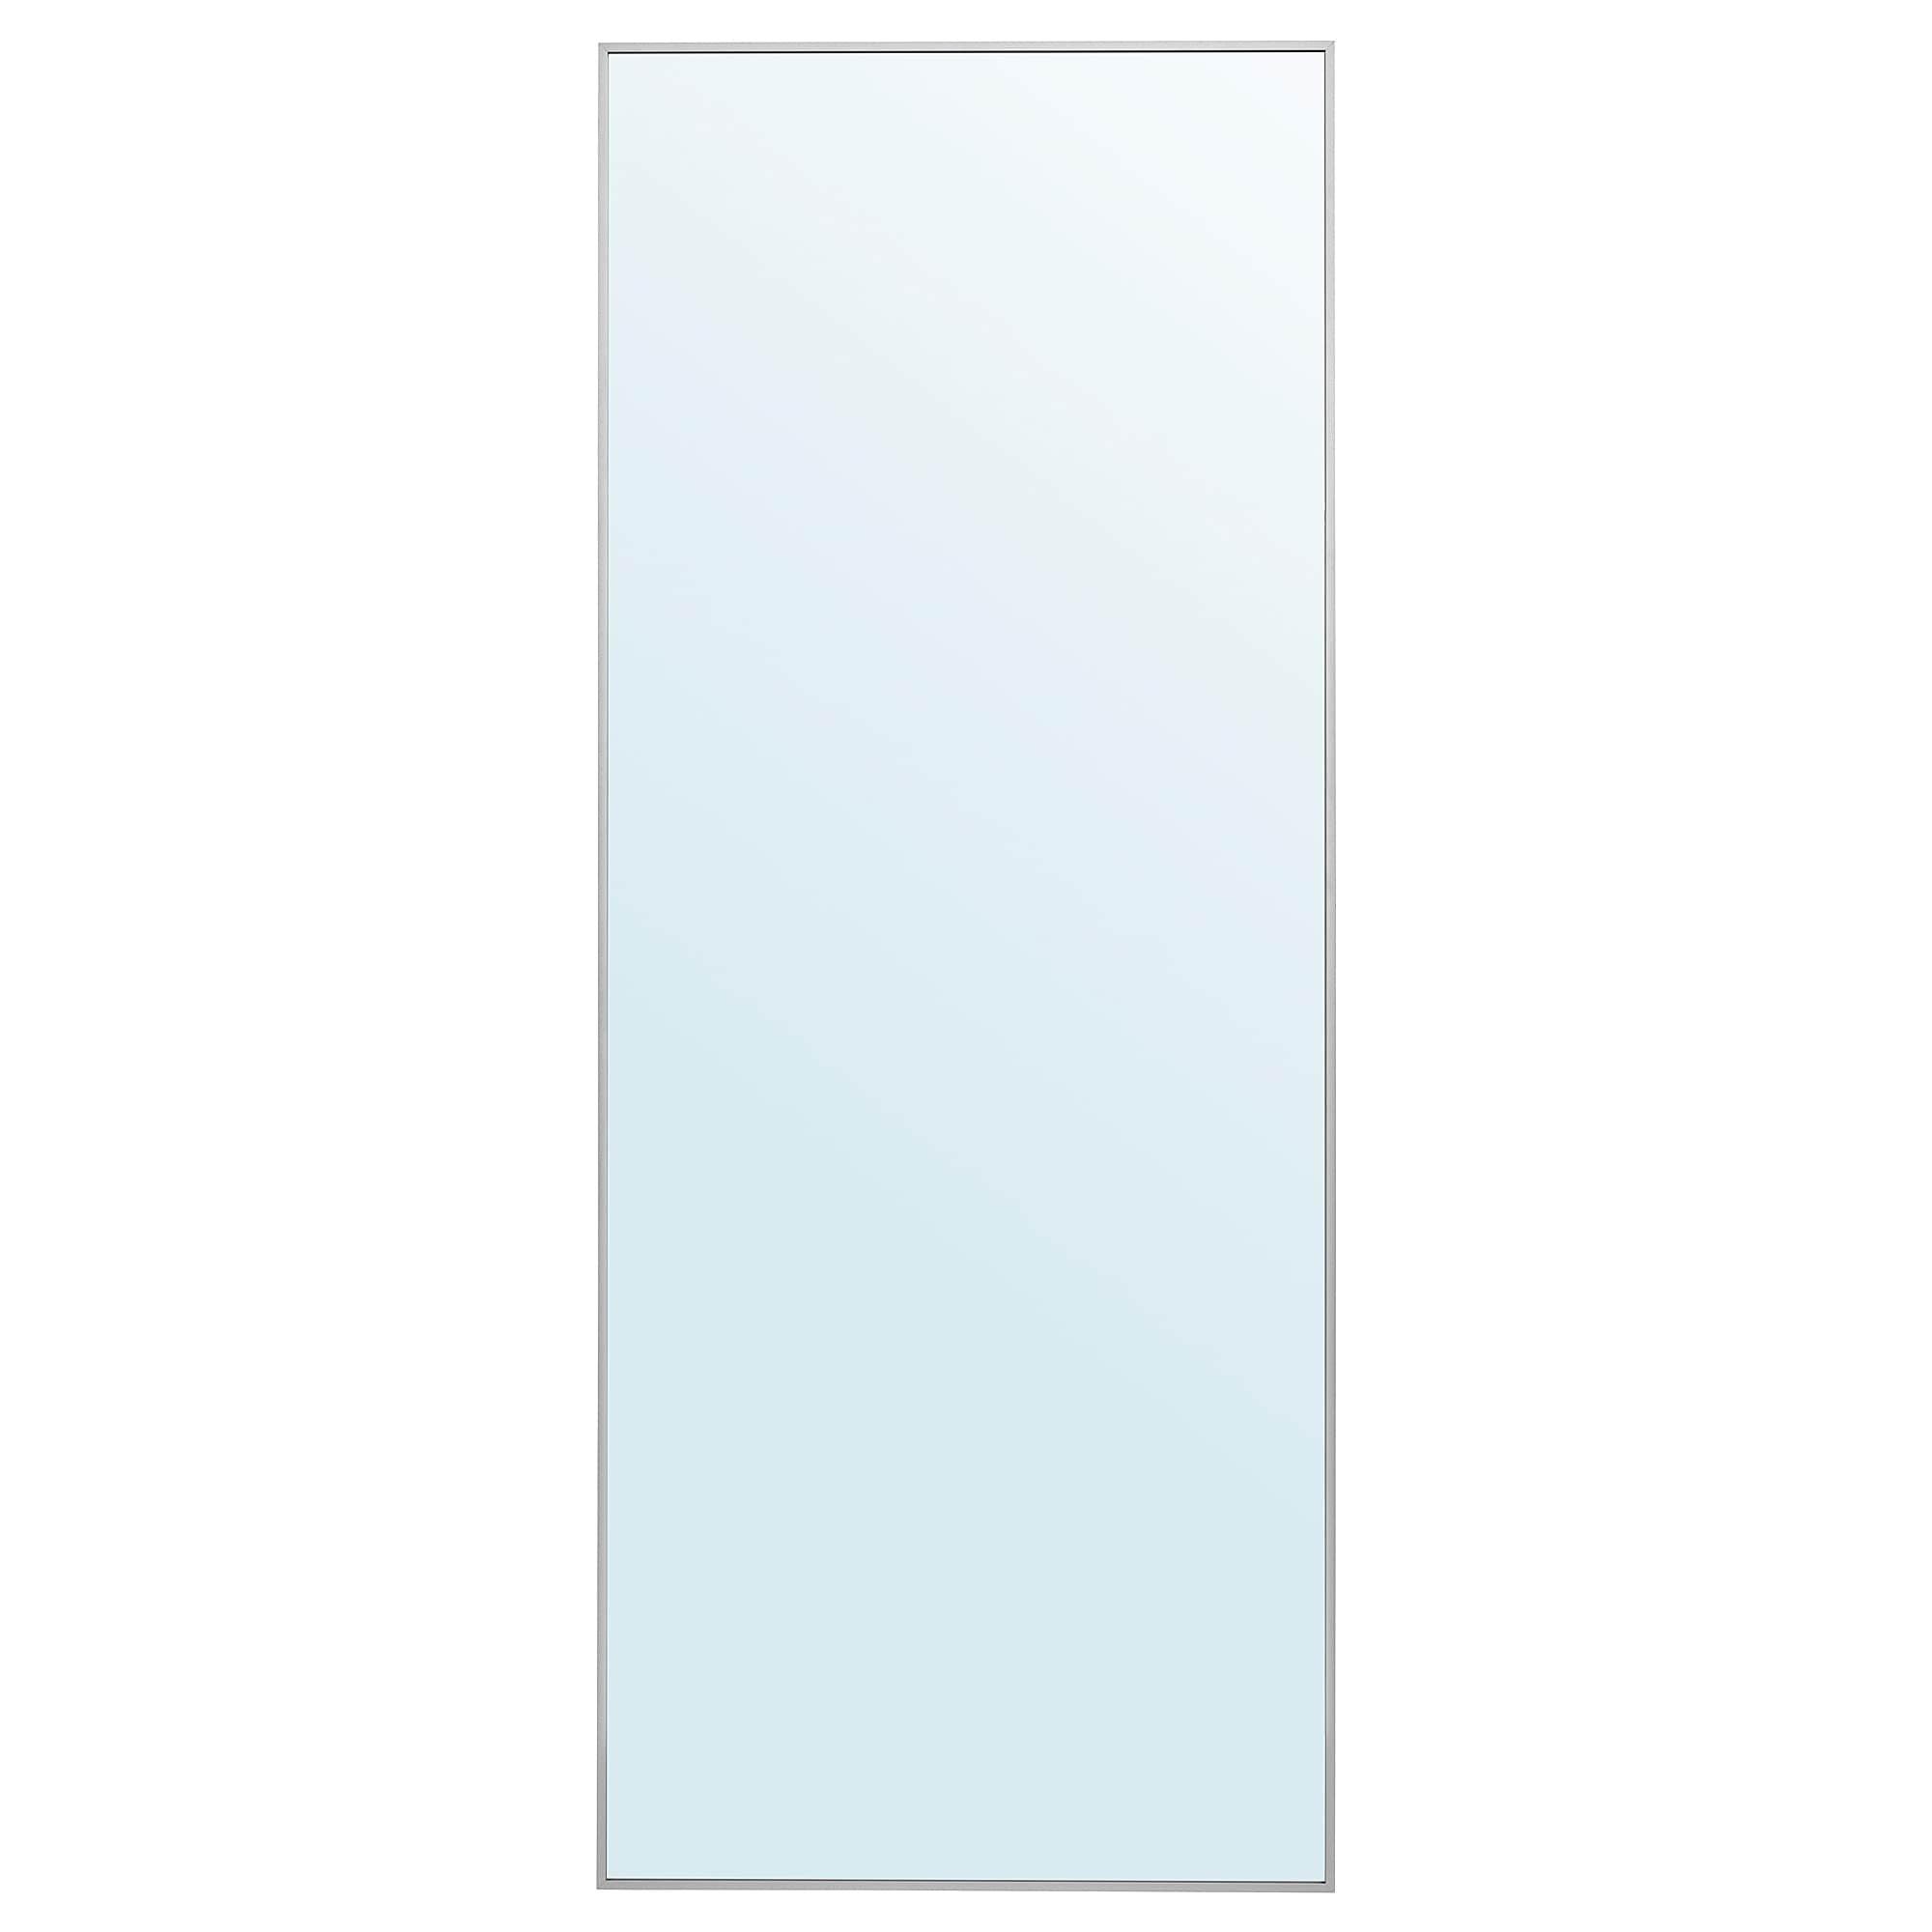 Hovet – Mirror, Aluminum Regarding Preferred Ikea Long Wall Mirrors (Gallery 19 of 20)